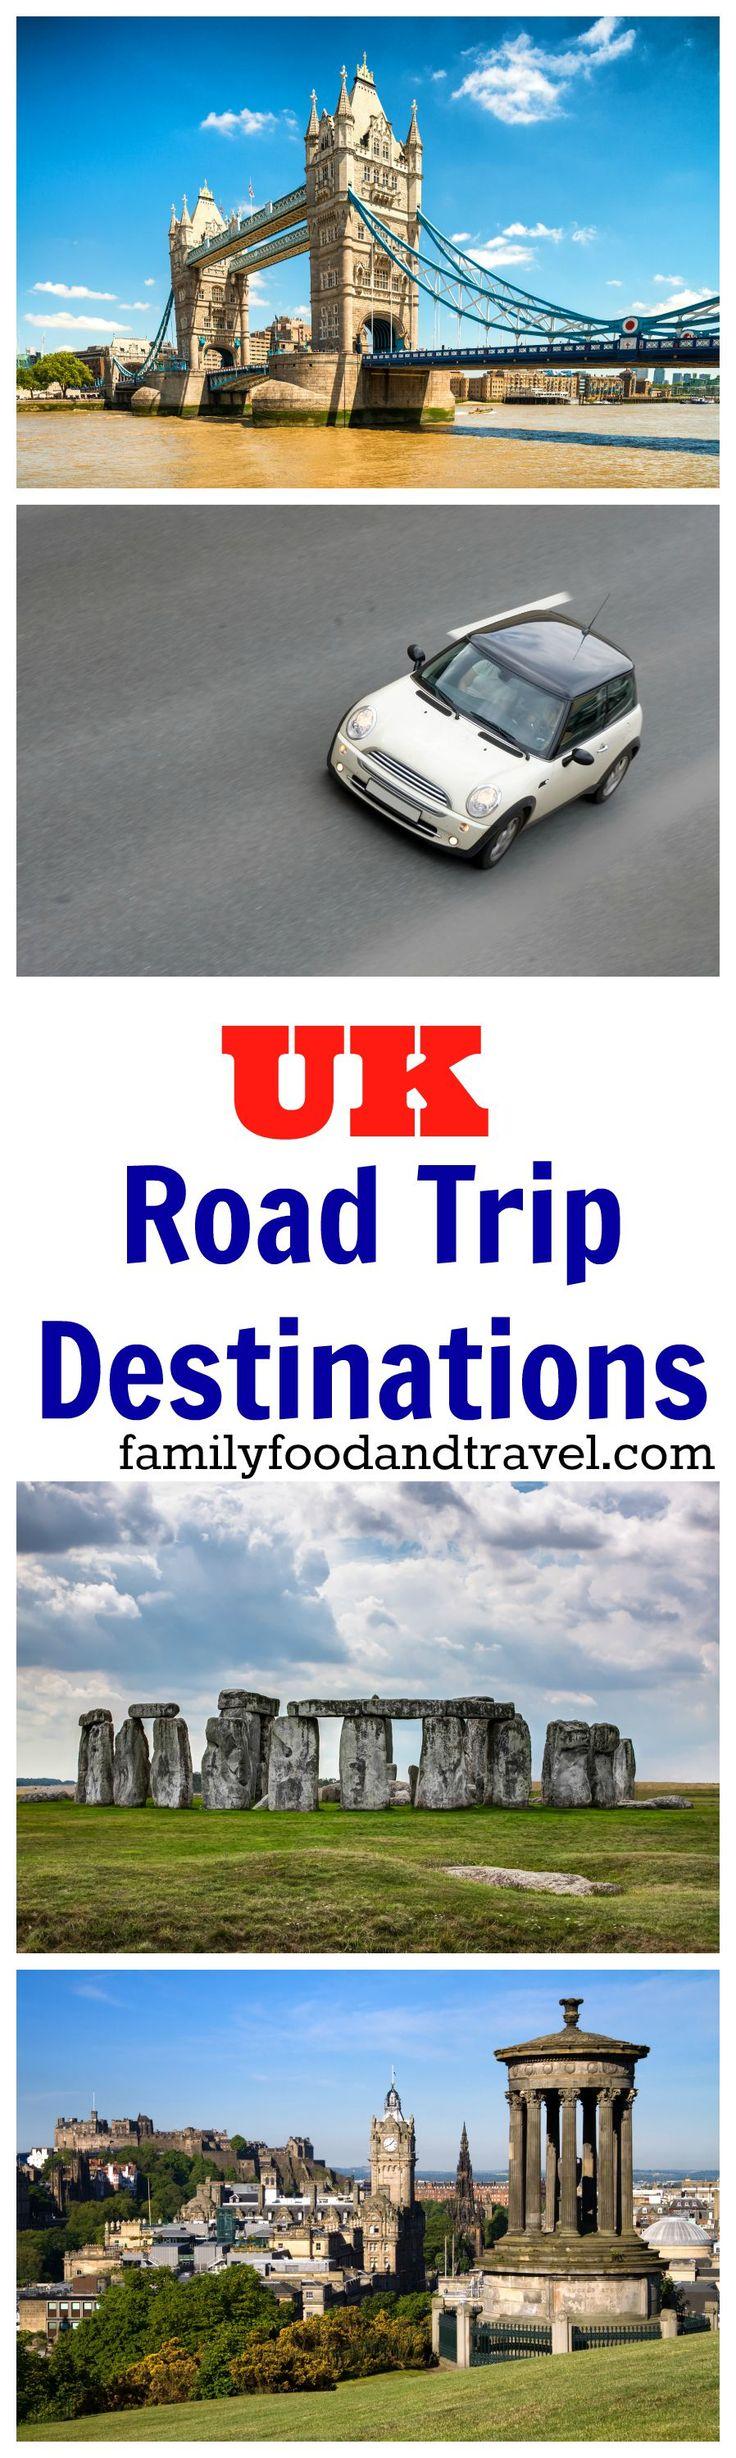 Best UK Road Trip Destinations